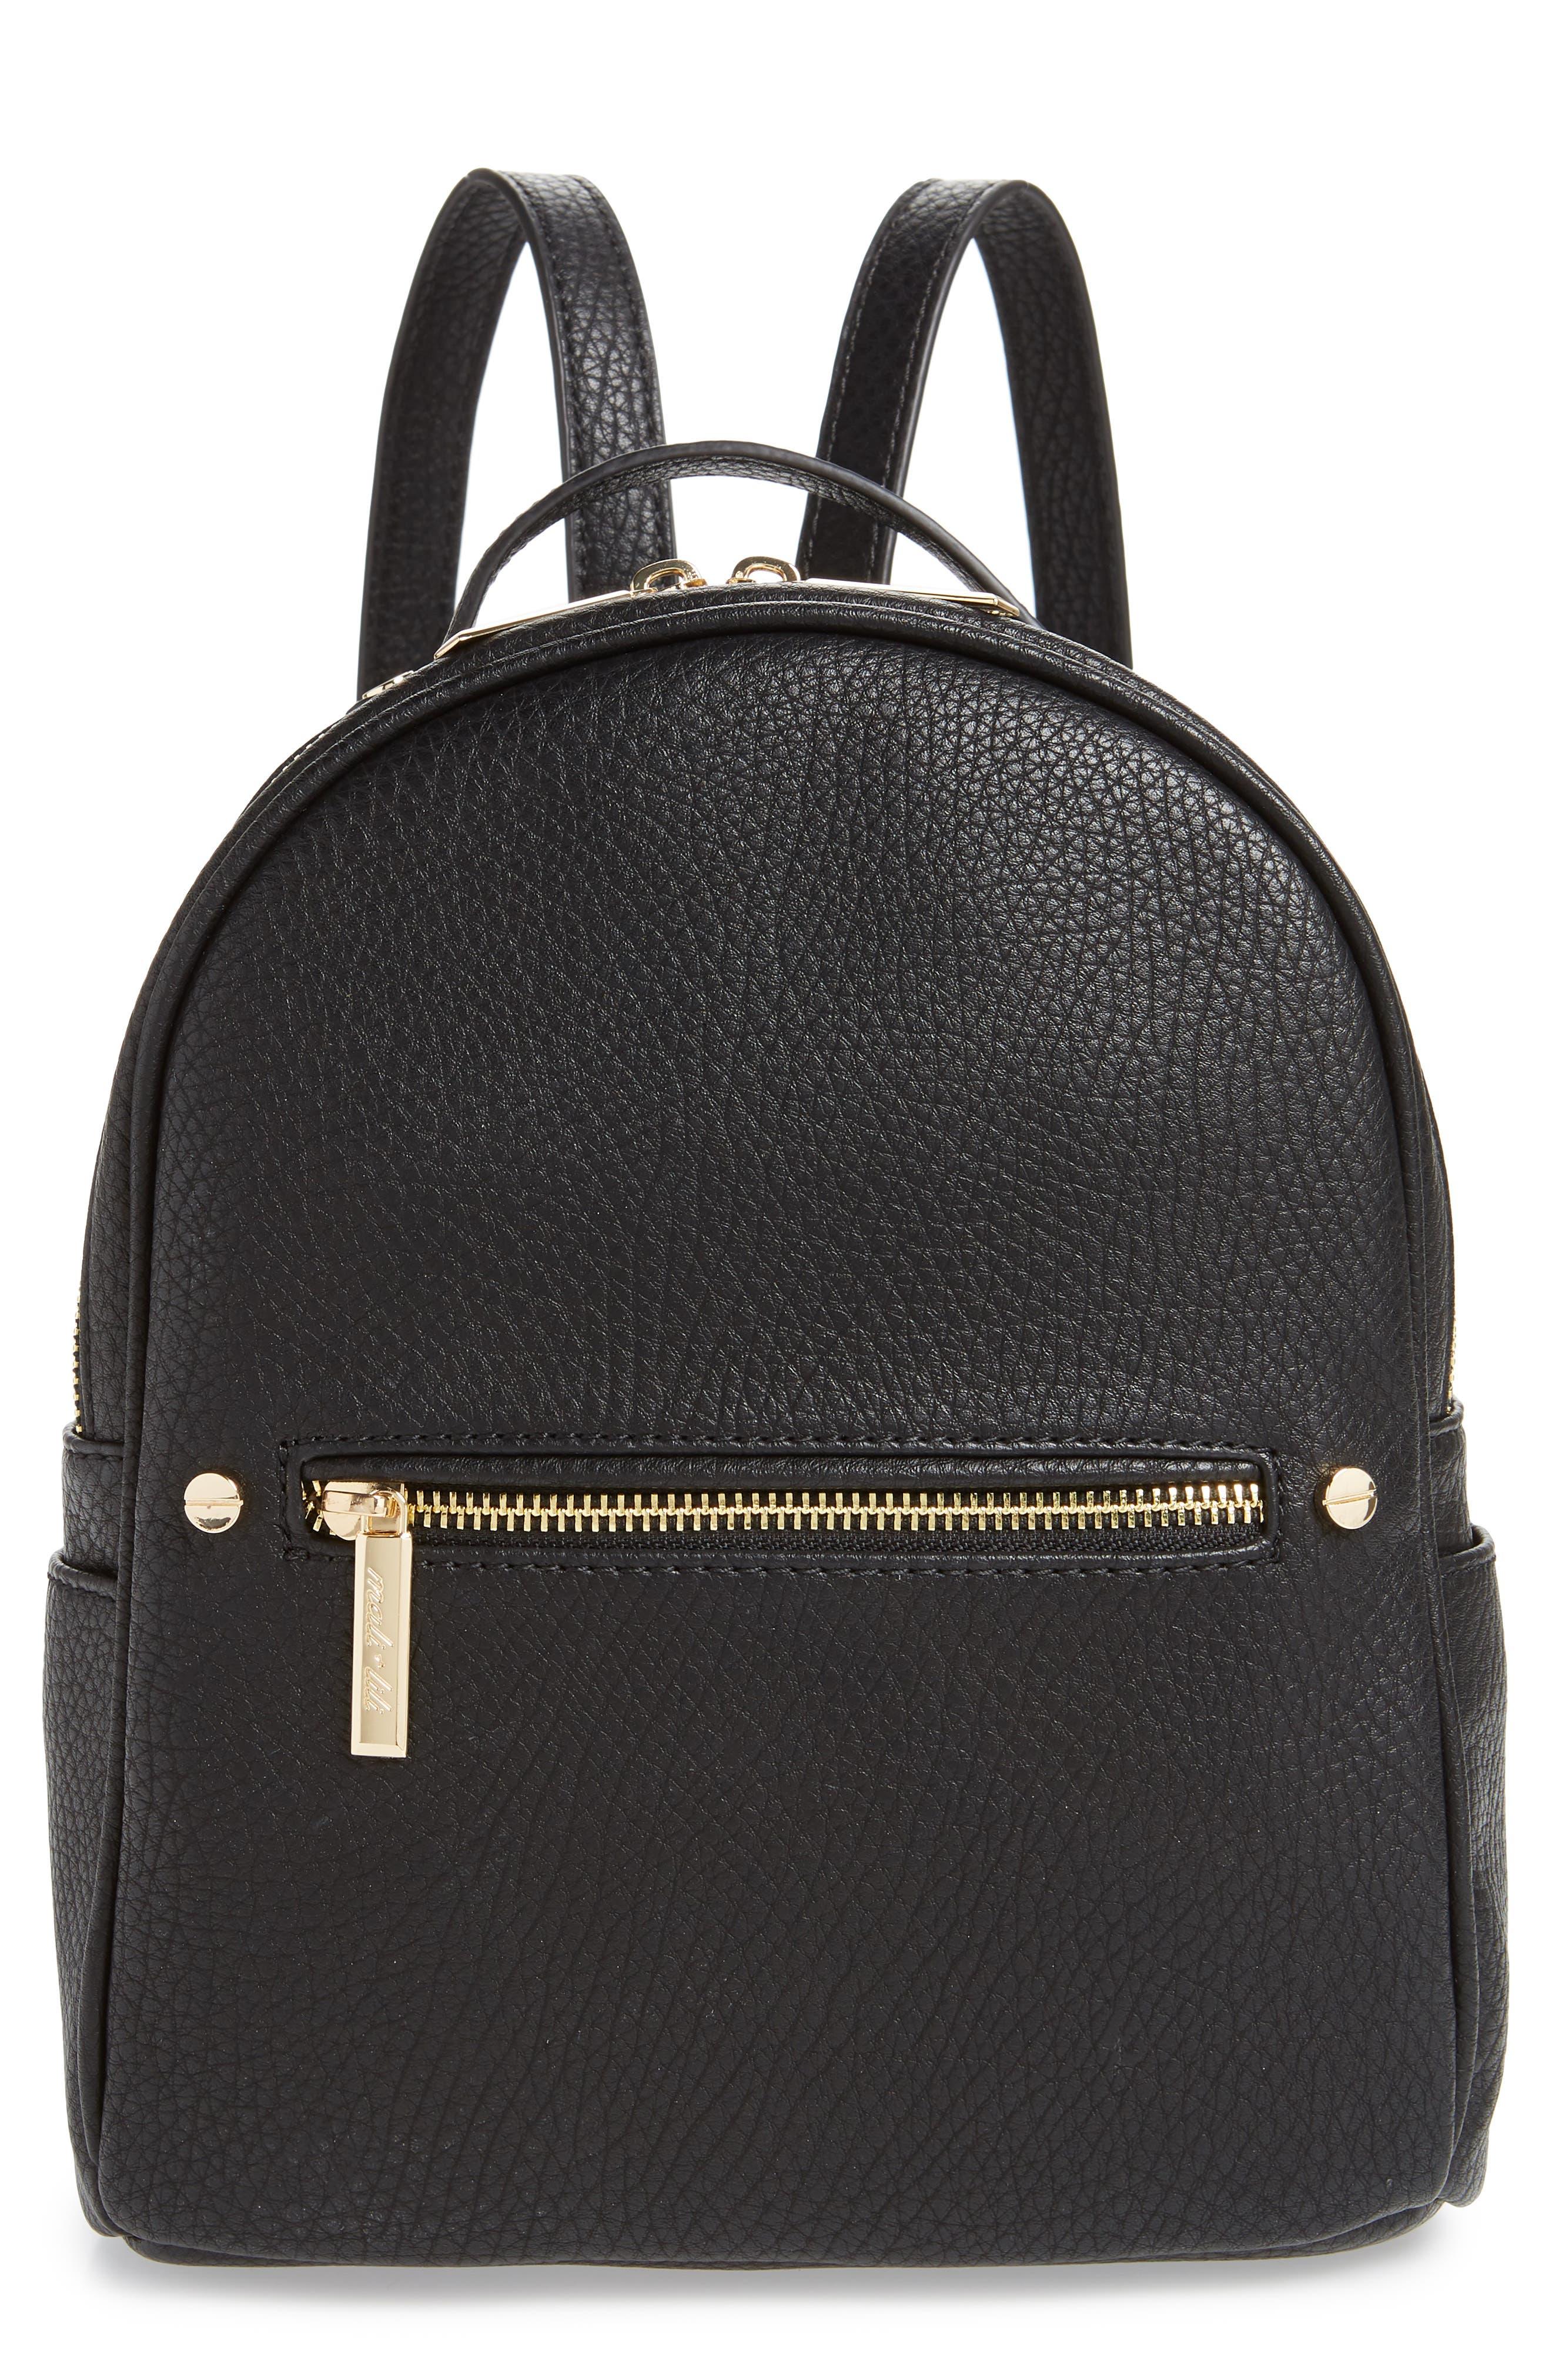 MALI + LILI Hanny Vegan Leather Backpack, Main, color, BLACK